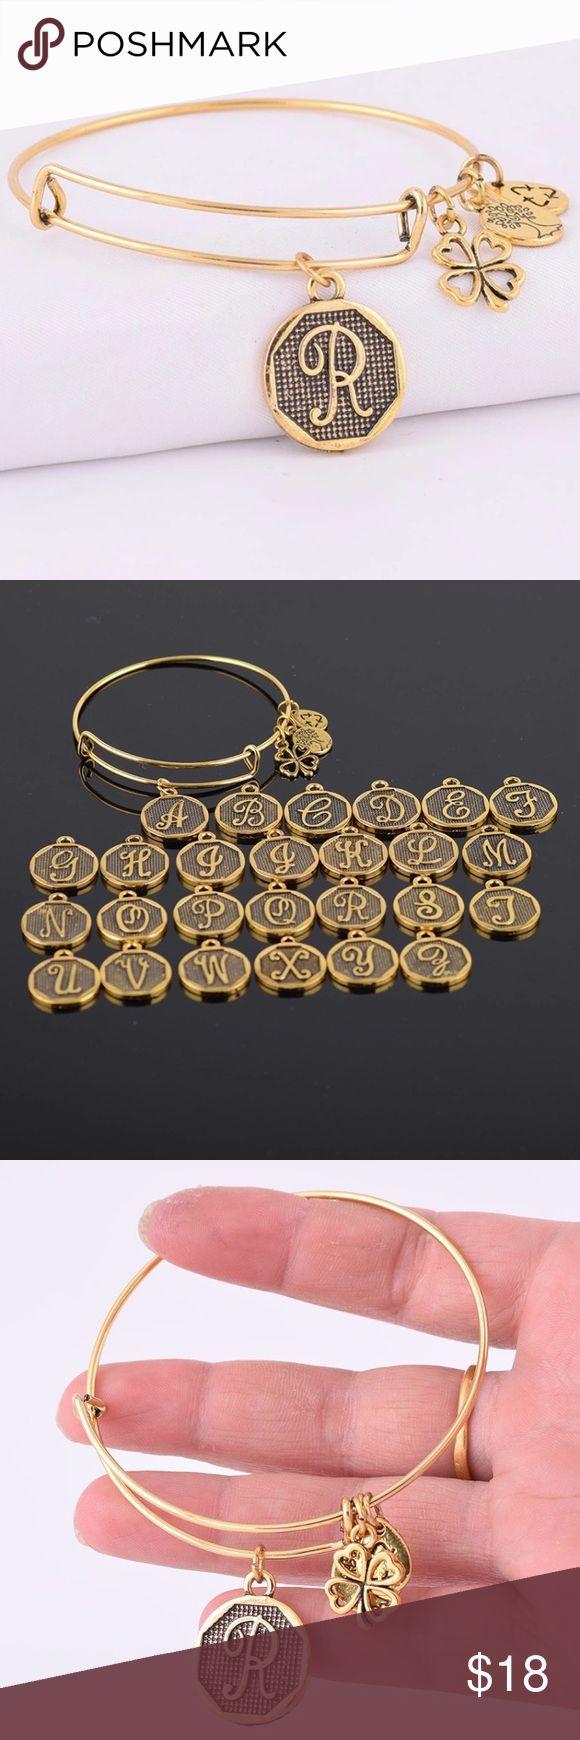 Gold Letter 'r'charm Bracelet Brand New! Alex And Ani Inspired Gold